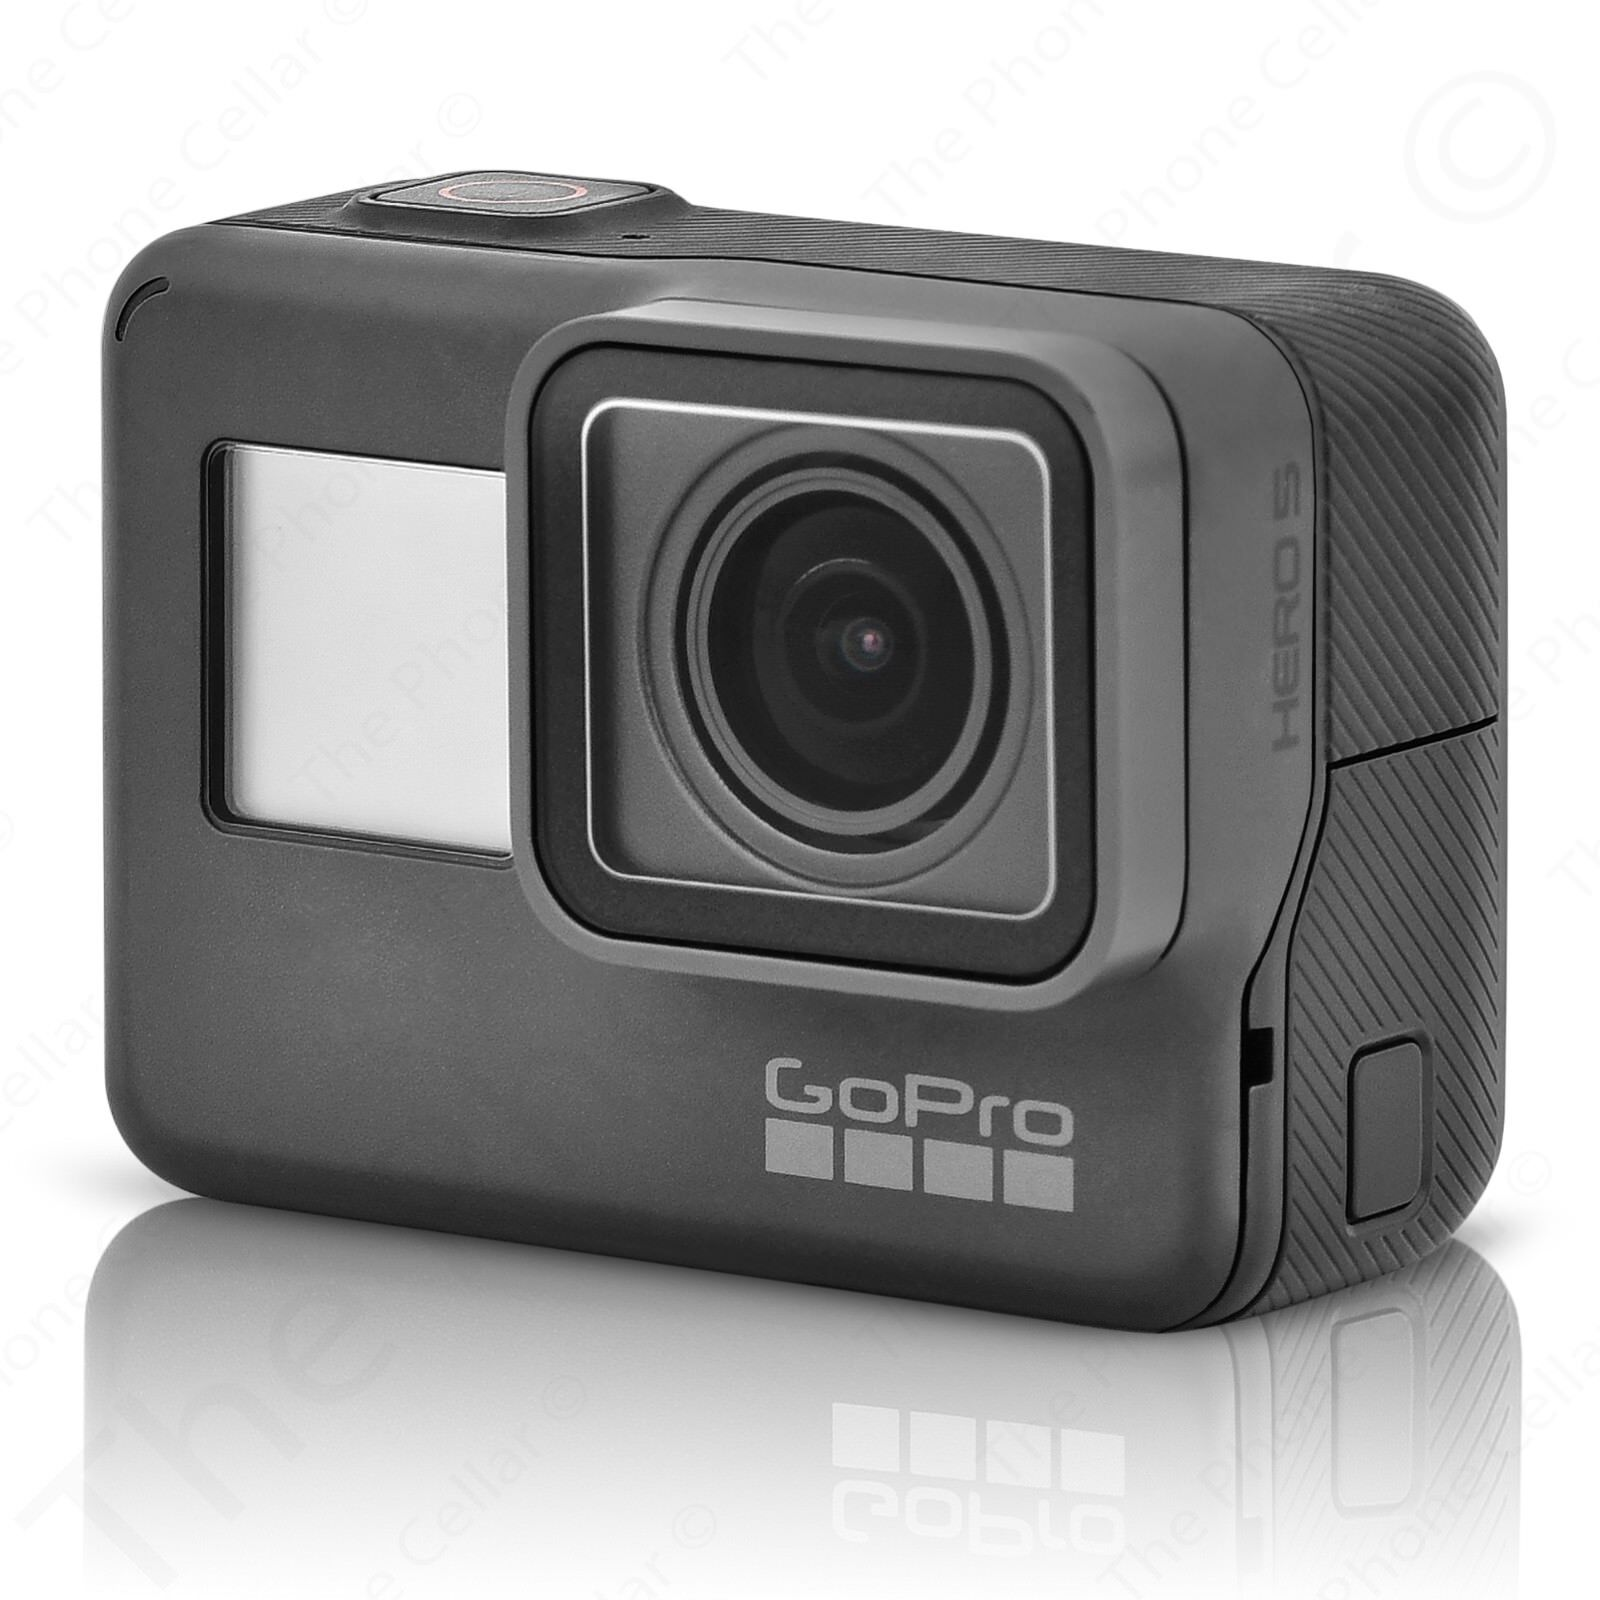 GoPro Hero 5 Black 4K Action Camera HD Camcorder CHDHX-502  eBay